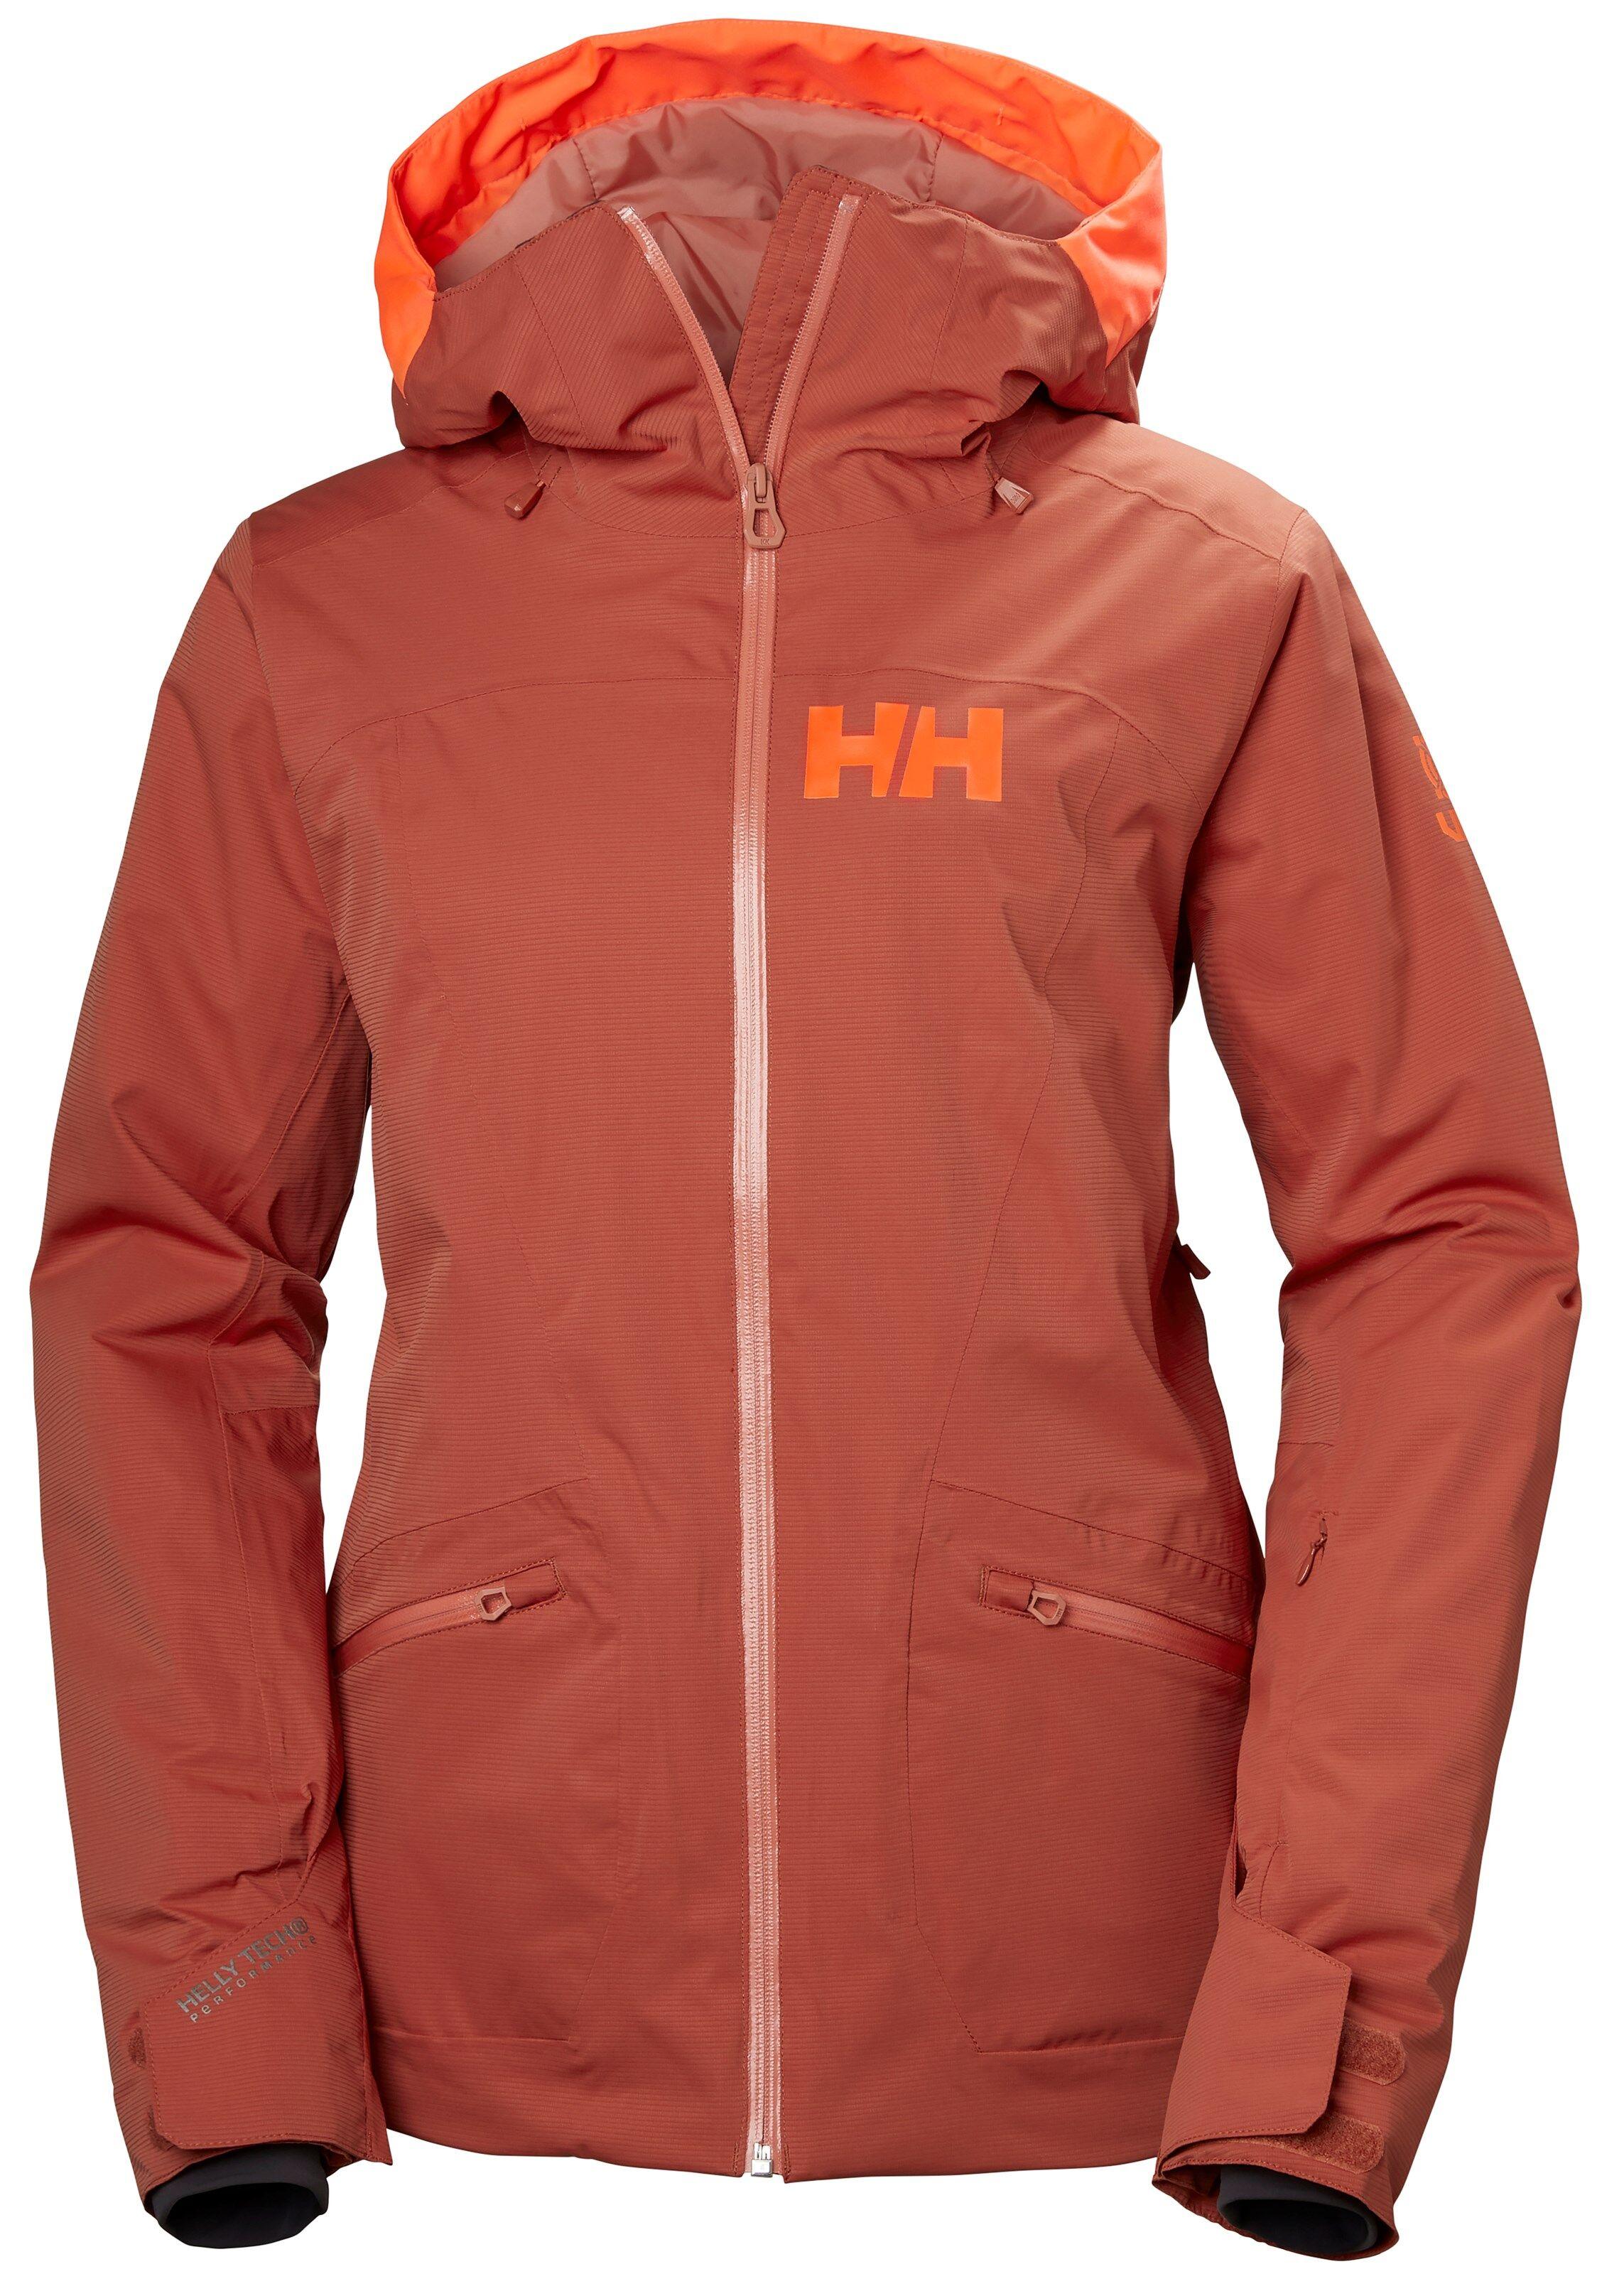 a9f8a257 Helly Hansen W Glory Jacket, skijakke dame Red Brick 65577-199 L 2018